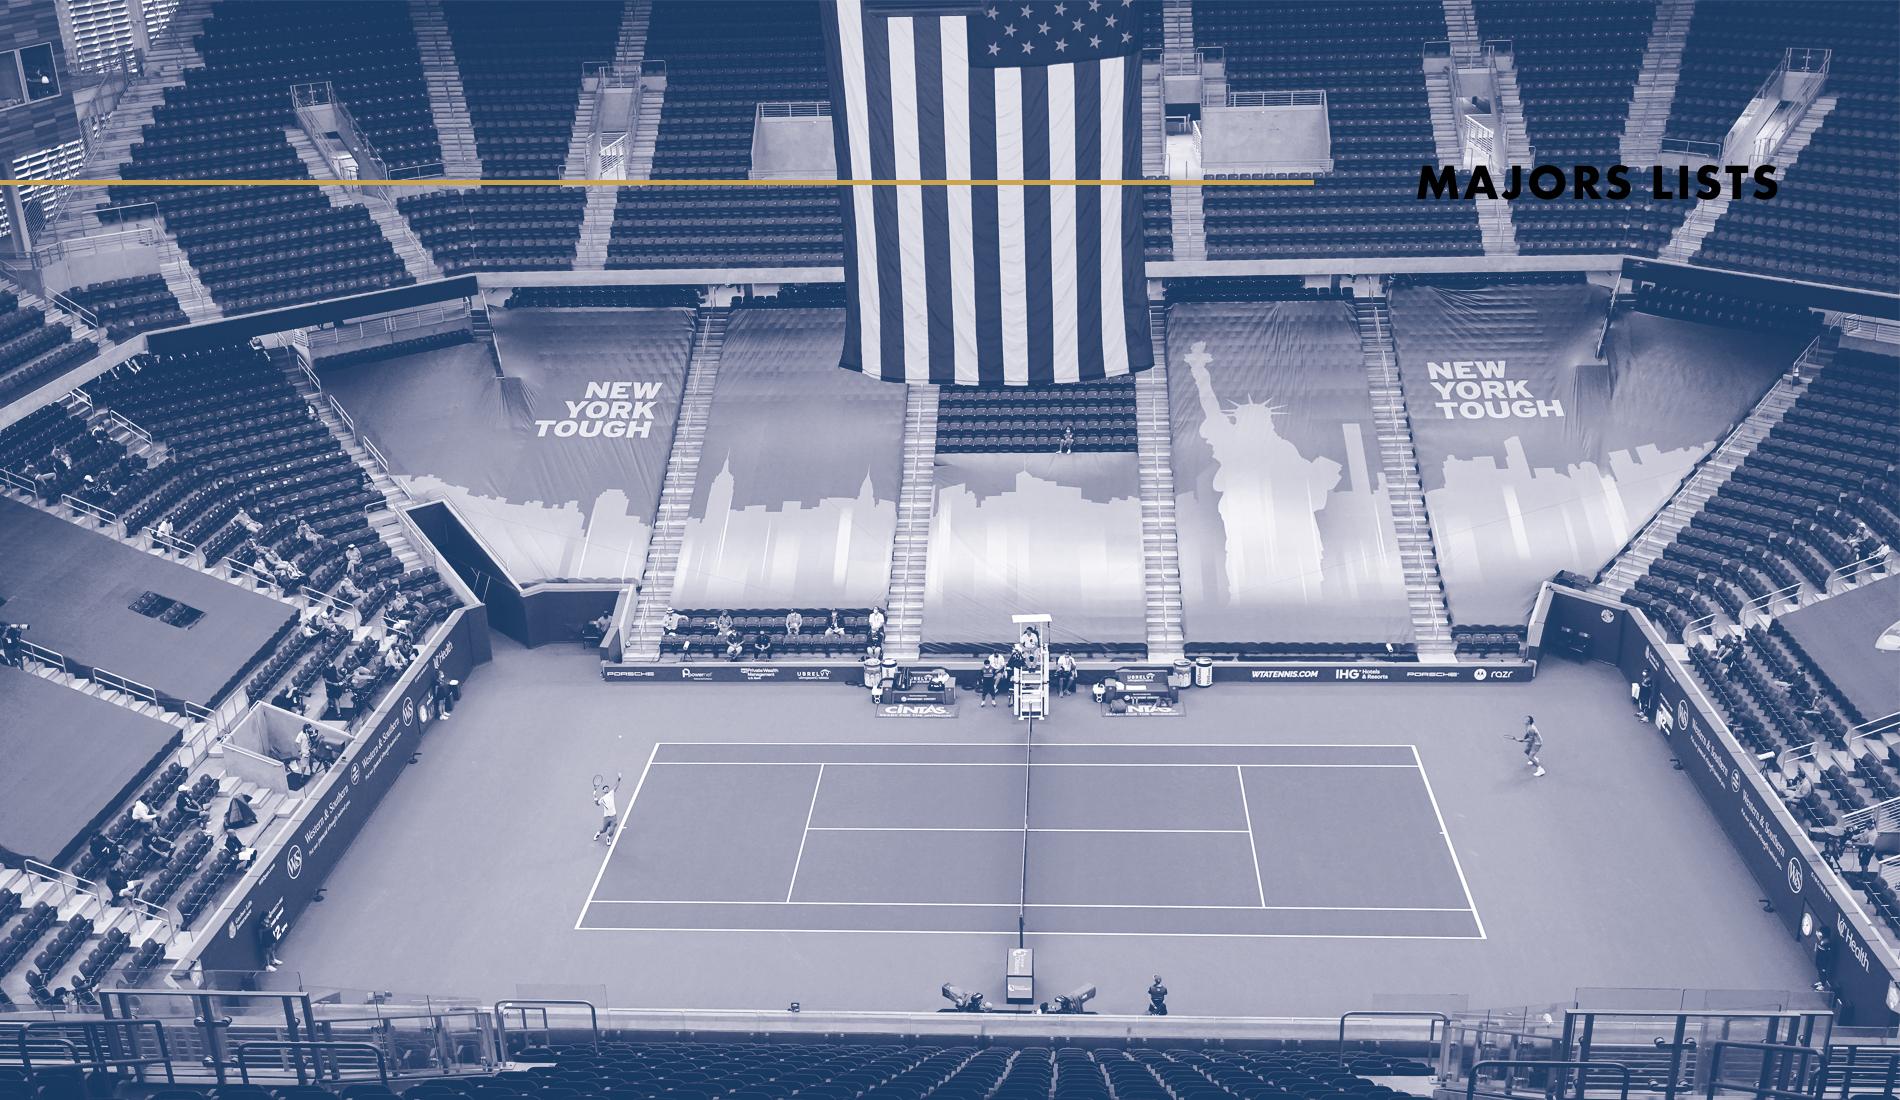 US Open 2020, Tennis Majors Lists